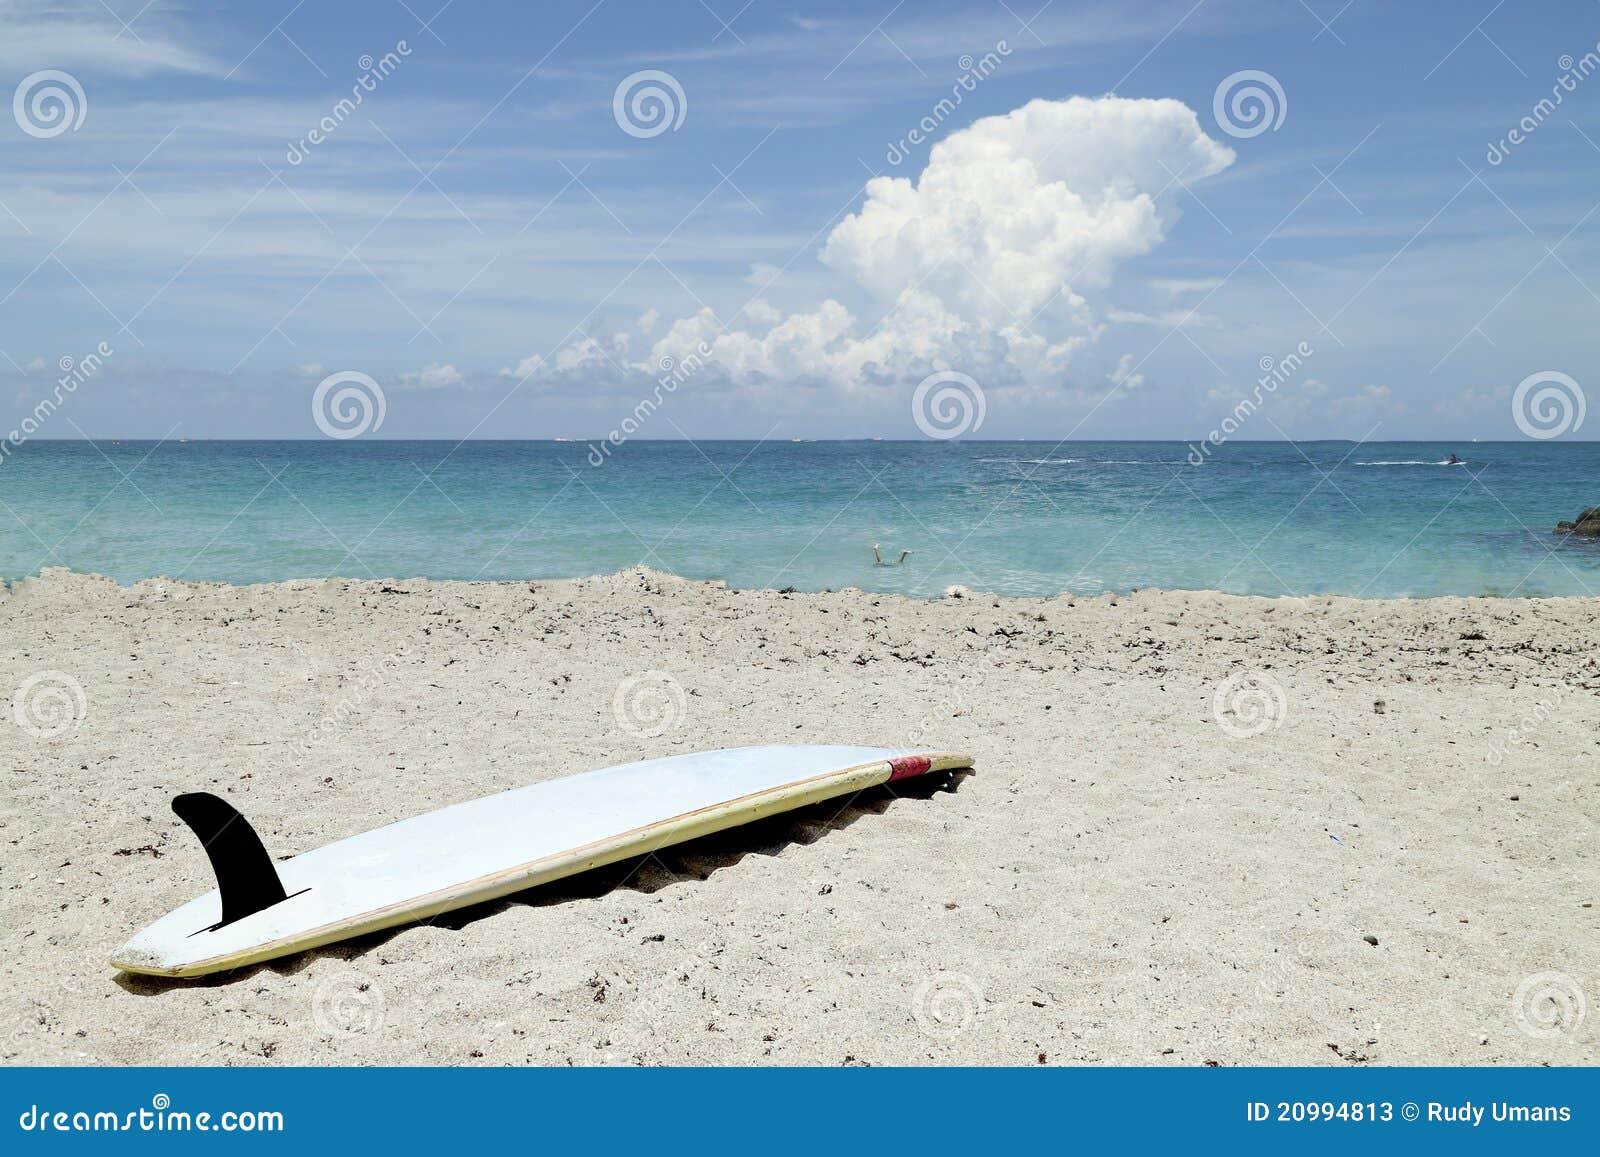 Surfboard On Beach Stock Photos - Image: 20994813